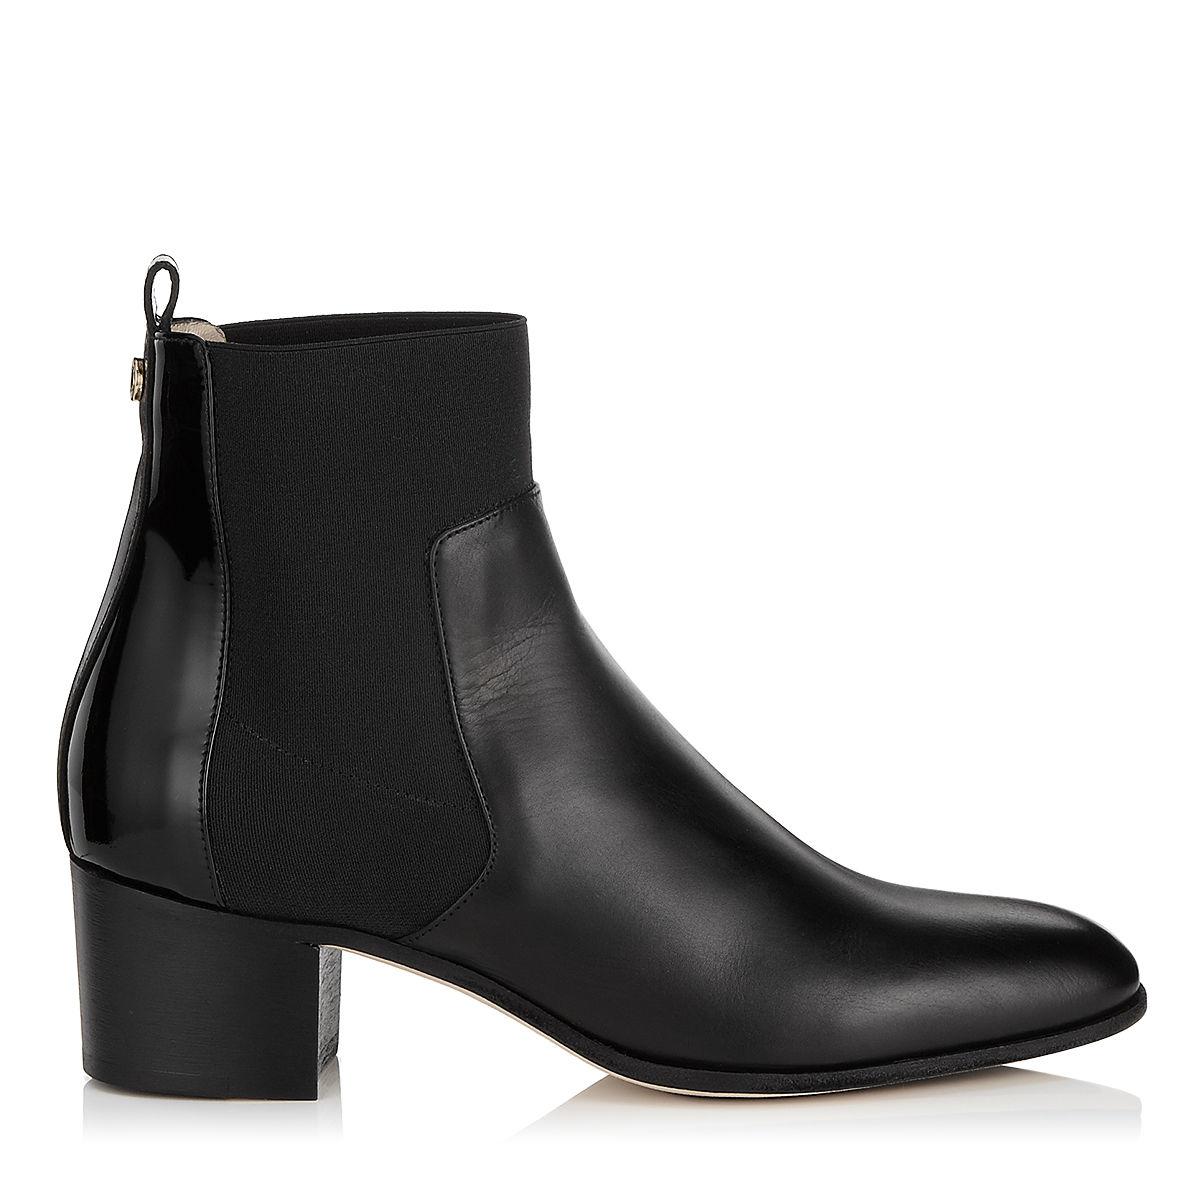 Footlocker Pictures Online Free Shipping Amazon Damen Klassische Stiefel TONI Veloursleder Zierriemen schwarz Jimmy Choo London 2018 Newest For Sale Footaction LllZItEa